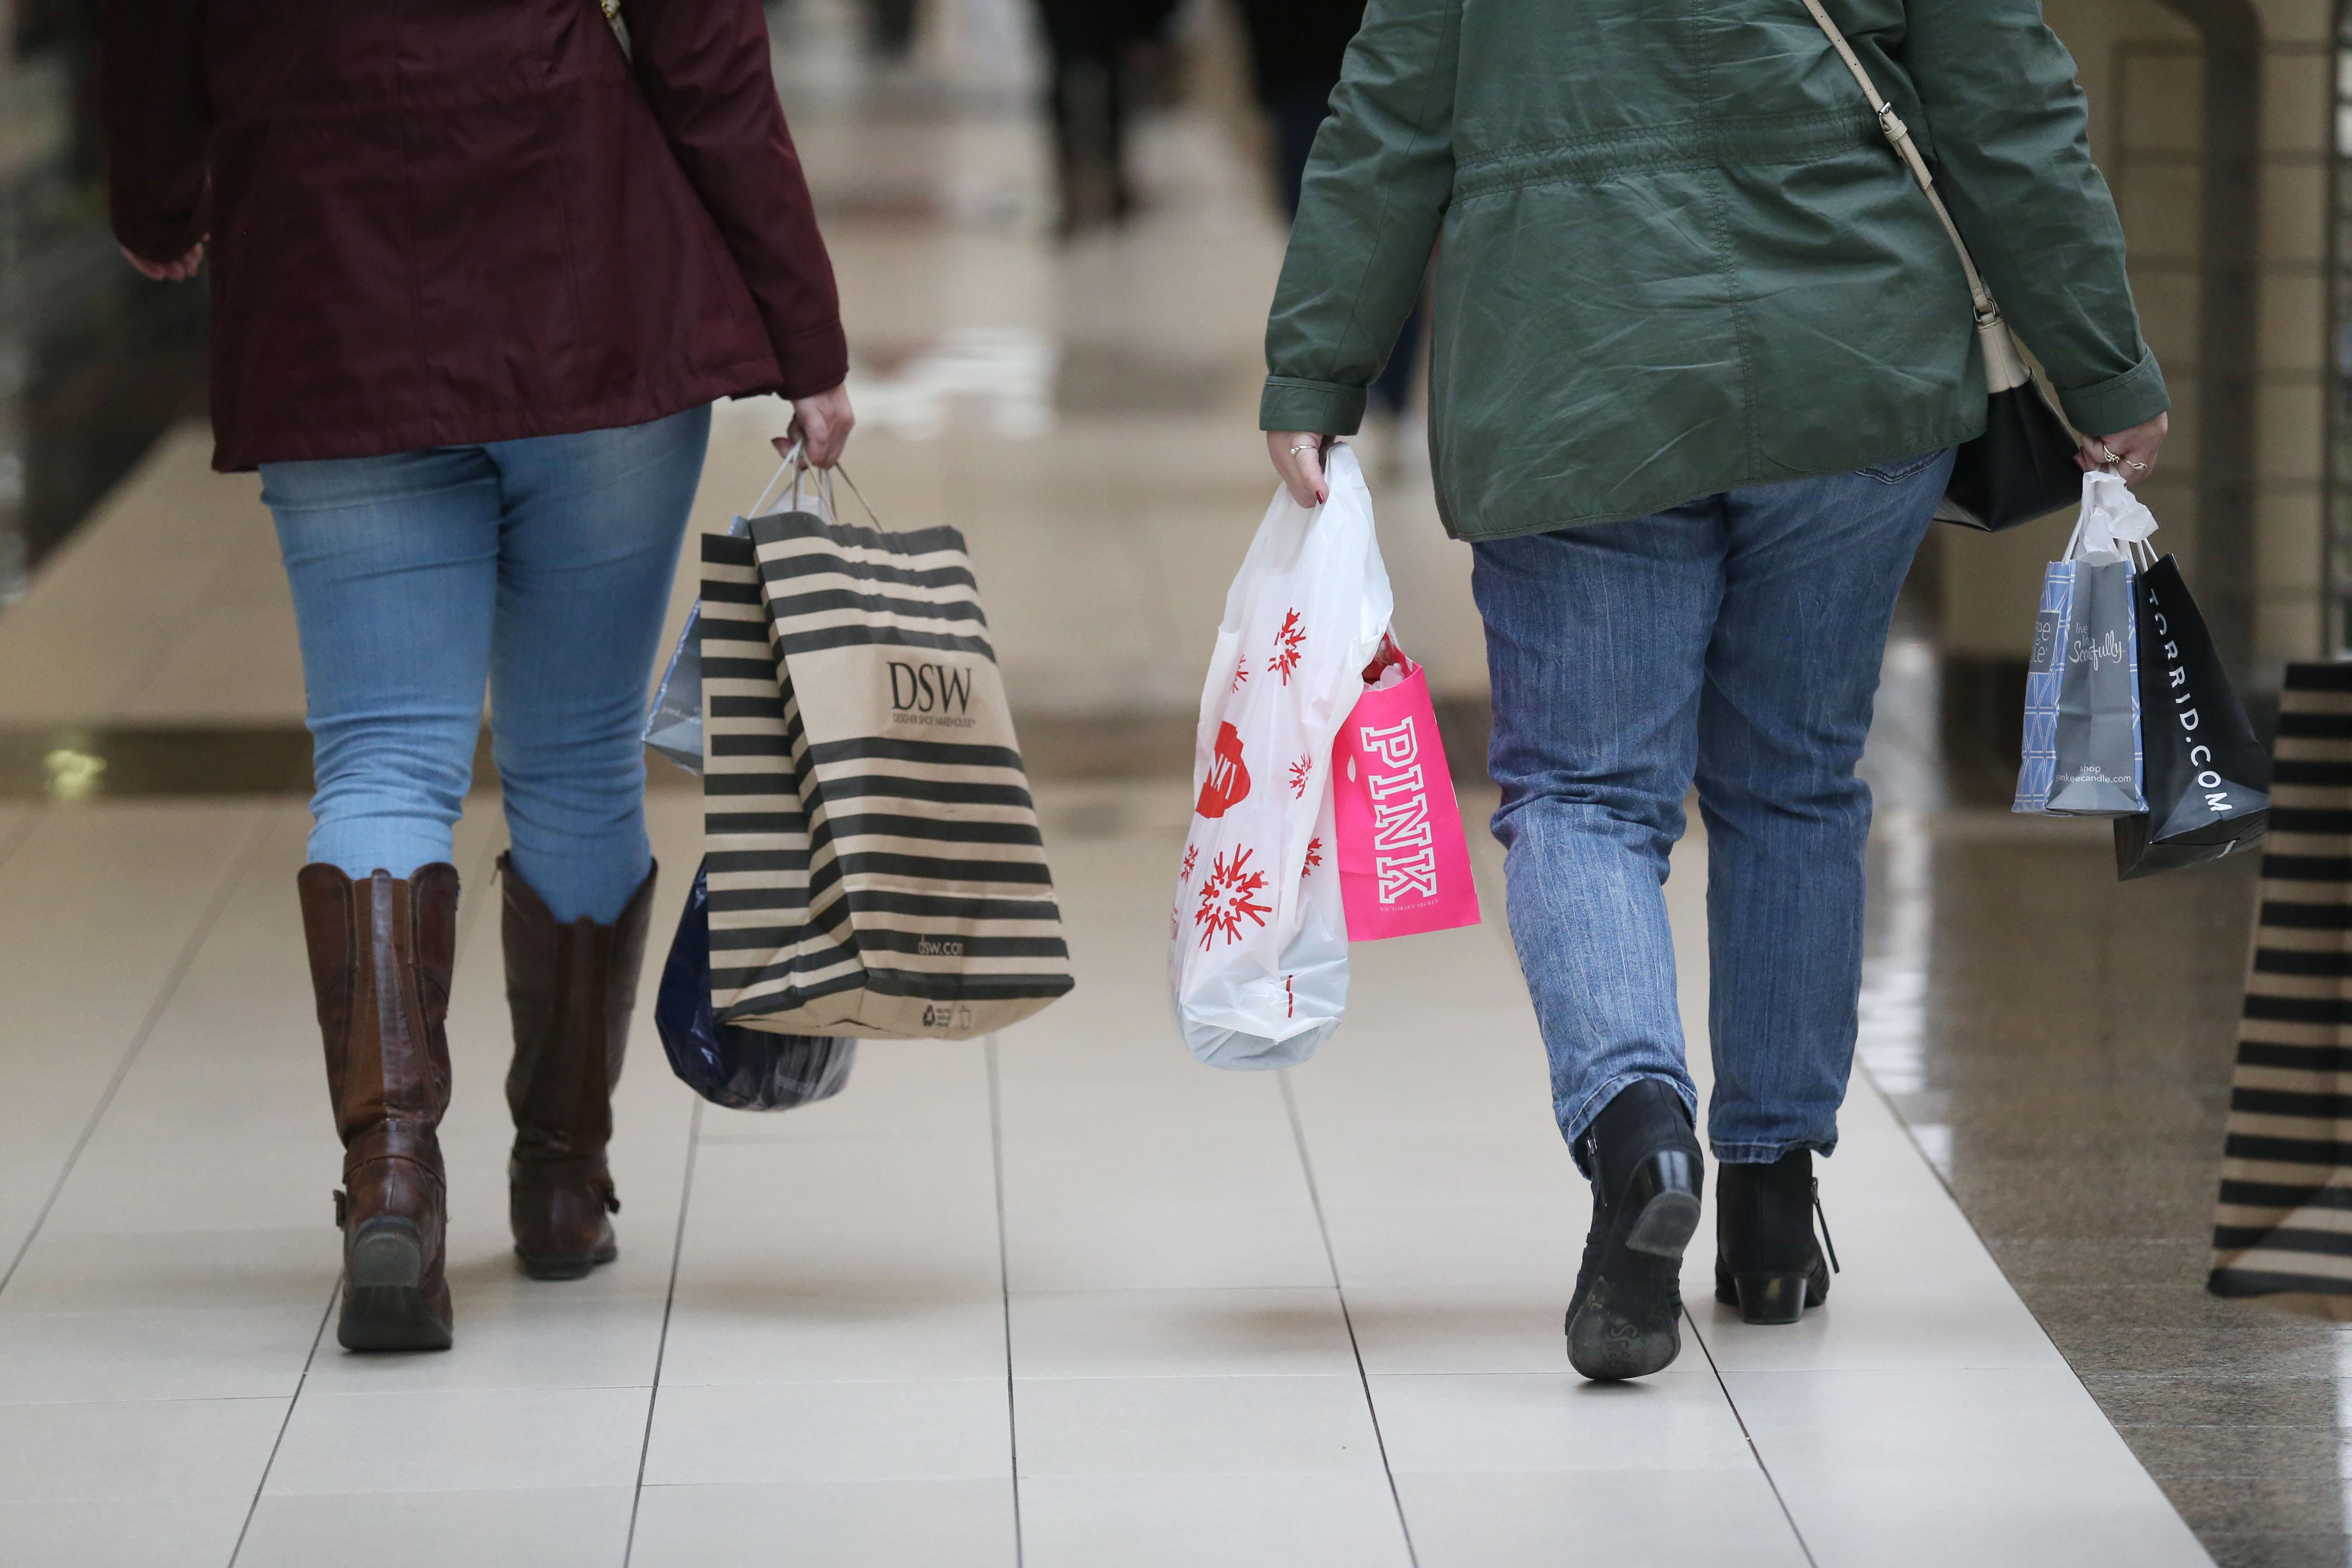 The final countdown to Christmas has sent many shoppers to the Walden Galleria in Cheektowaga. (Sharon Cantillon/Buffalo News)